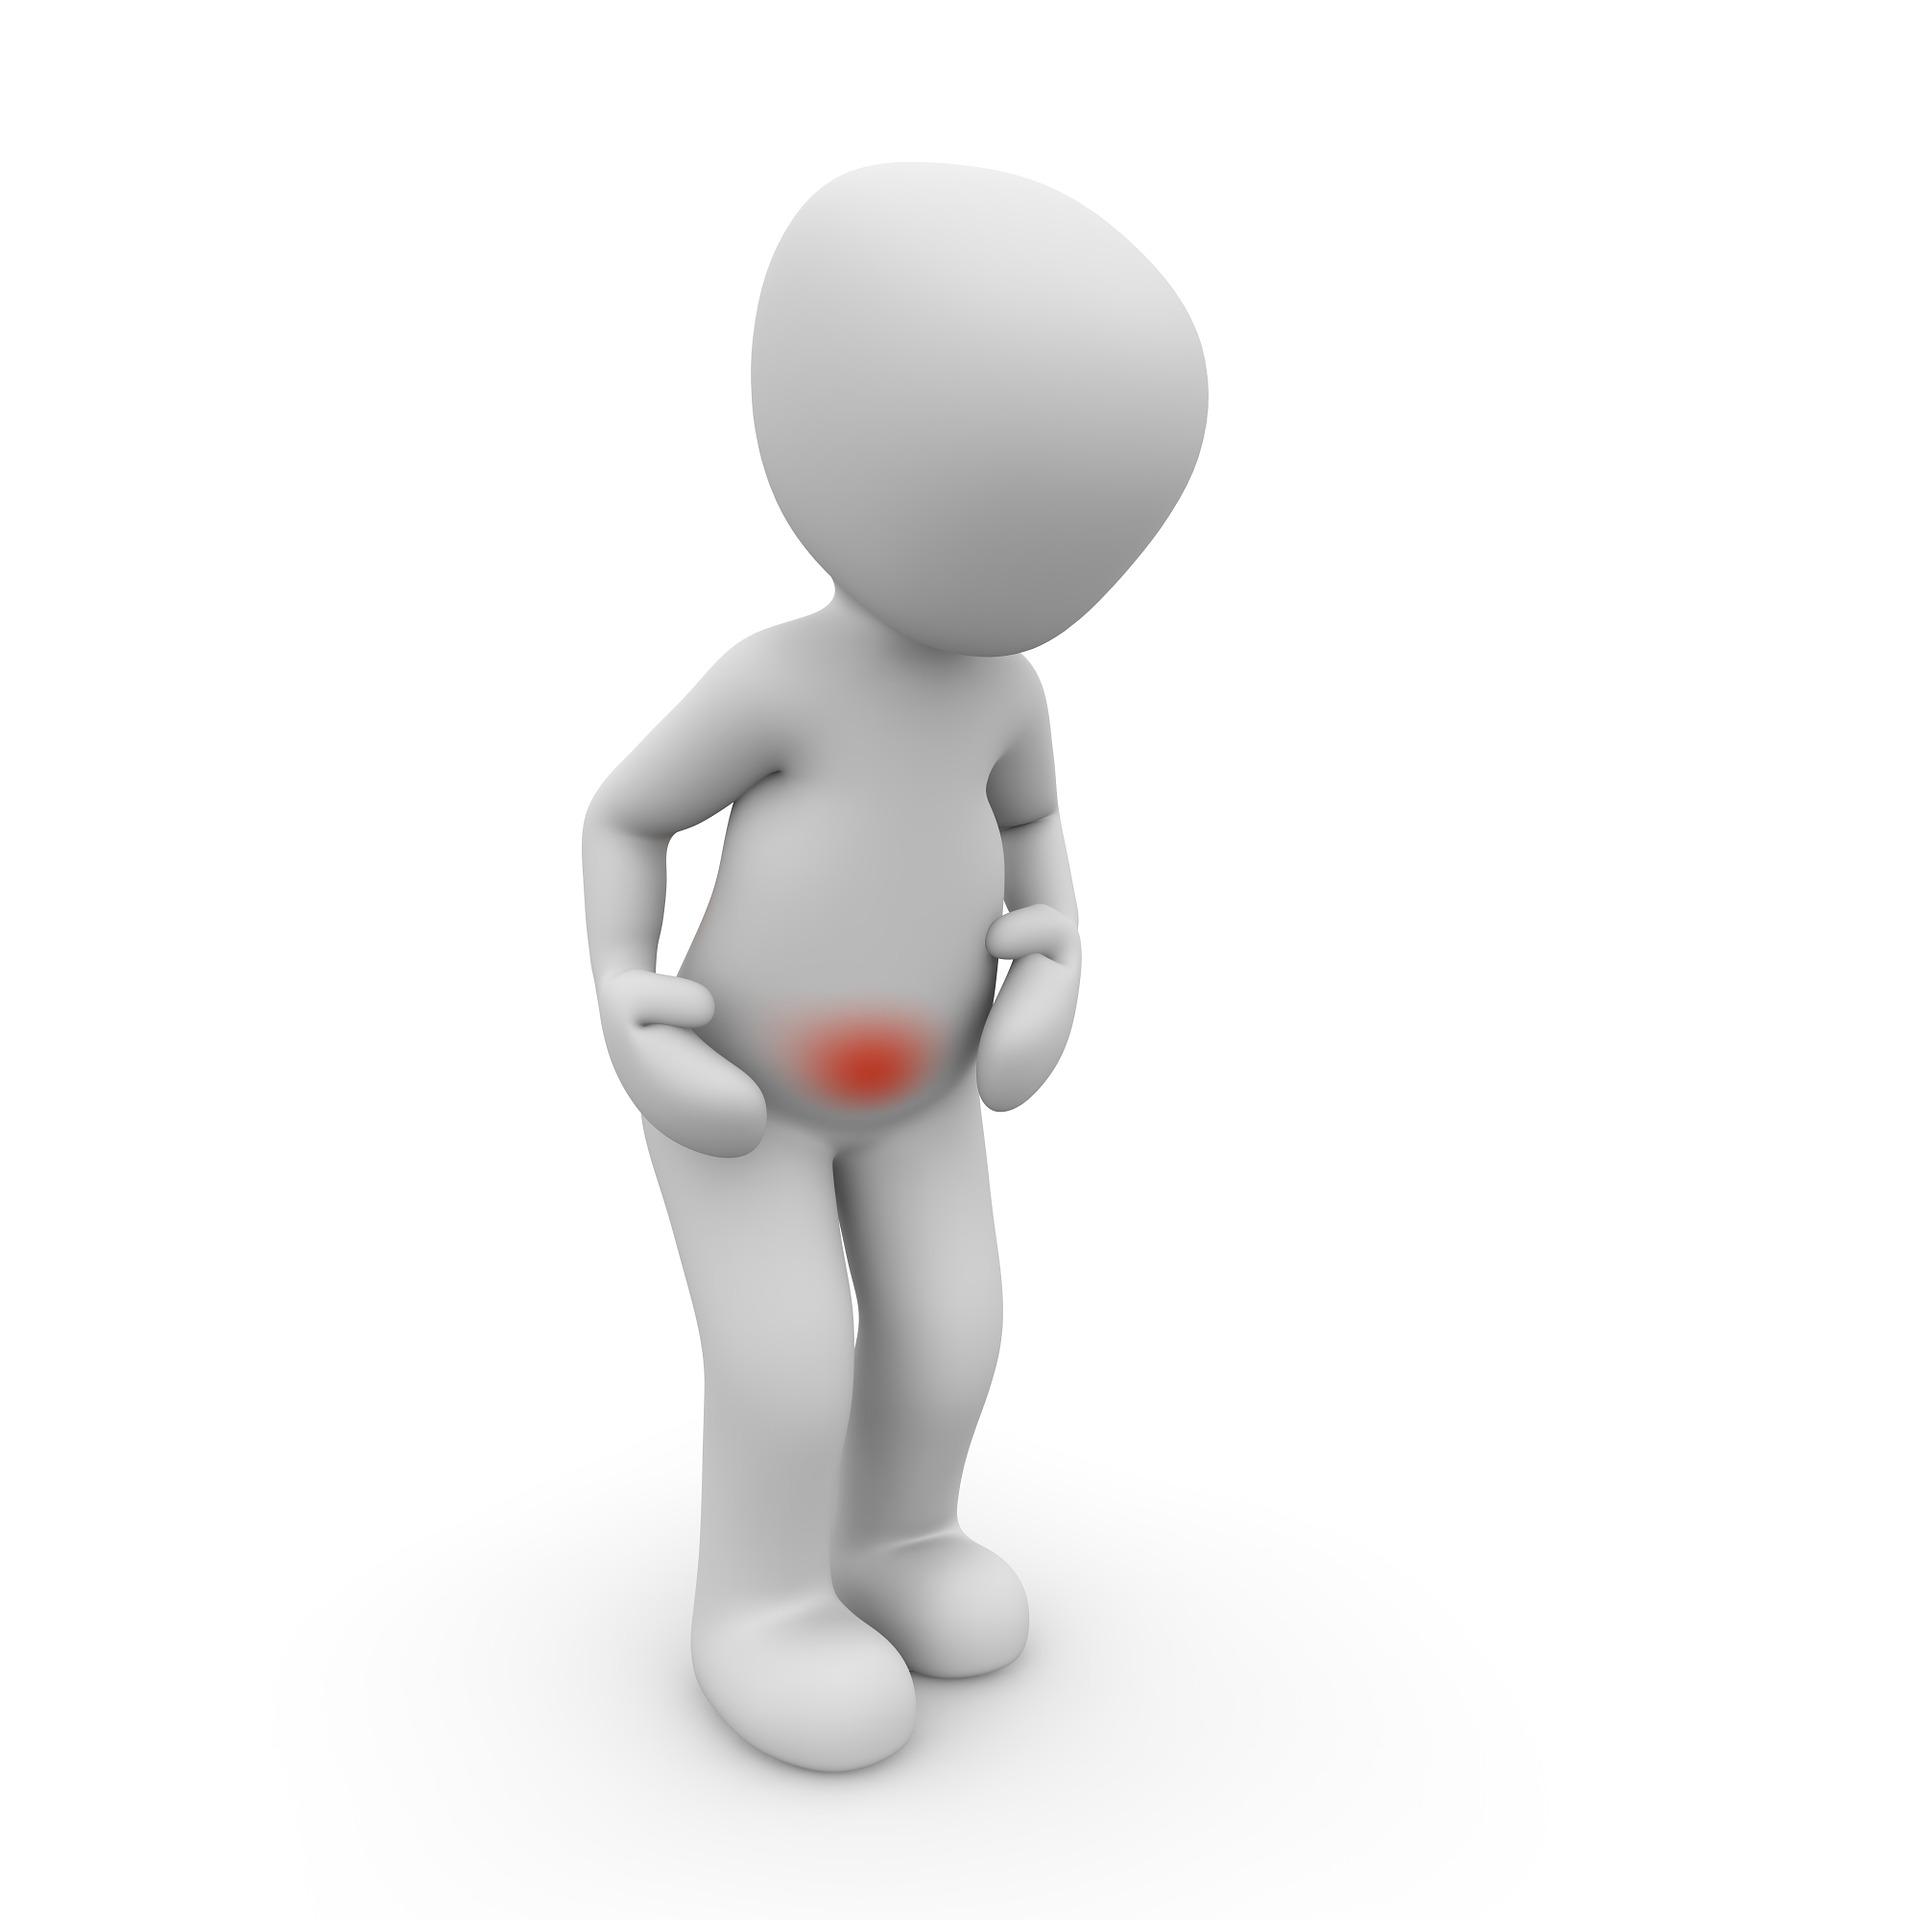 dieet spastische darm PDS IBS collitis drenthe